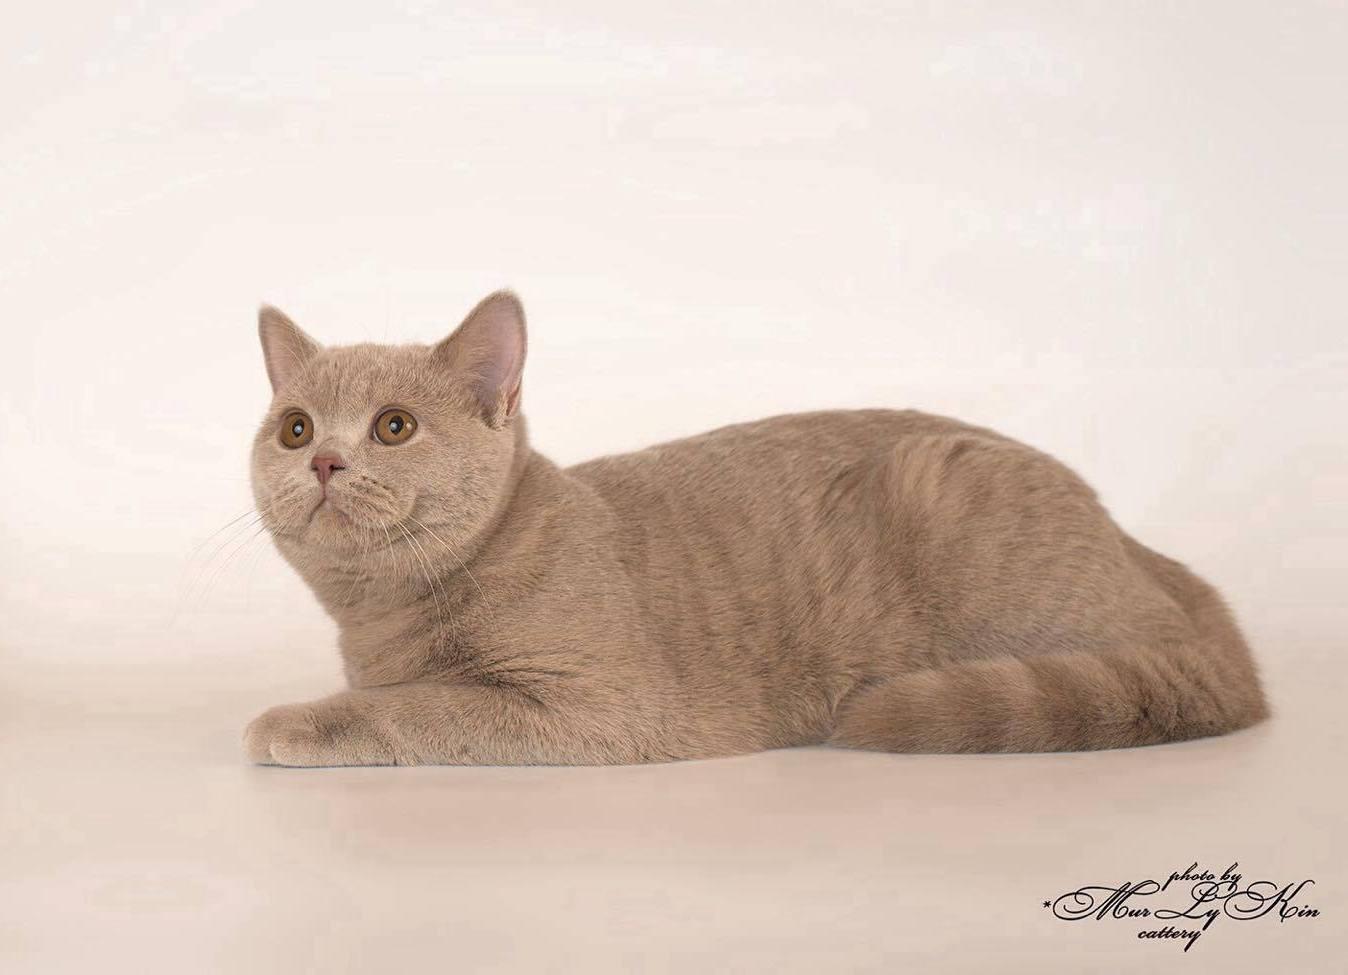 Названия окрасов британских кошек с фото